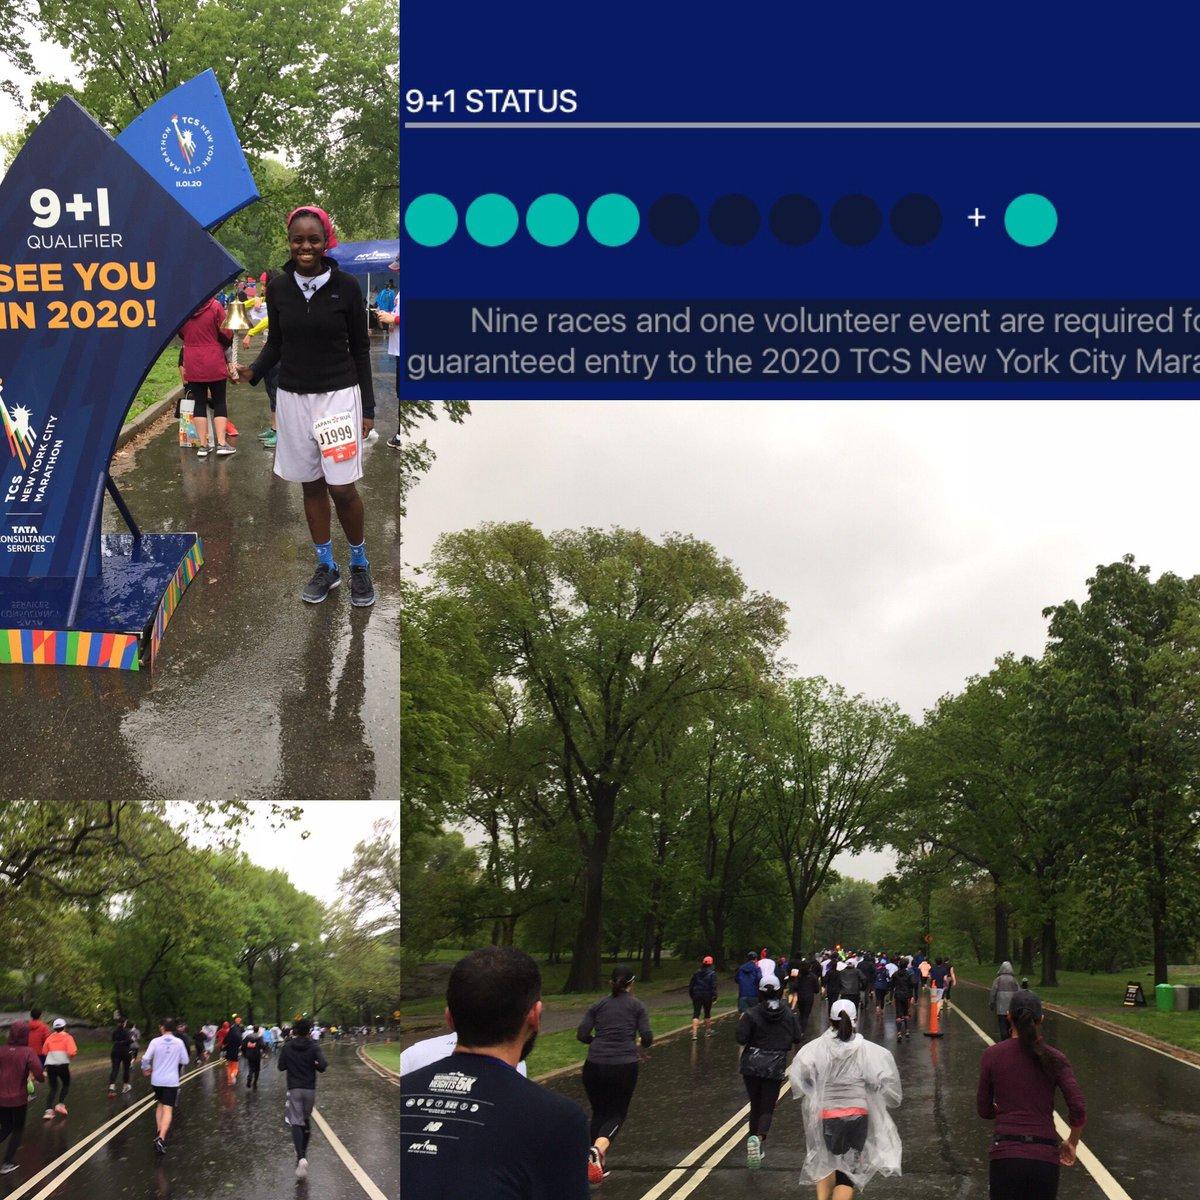 Halfway through… @NYCMarathon @NYRR #RunForLife 🏃🏾♀️